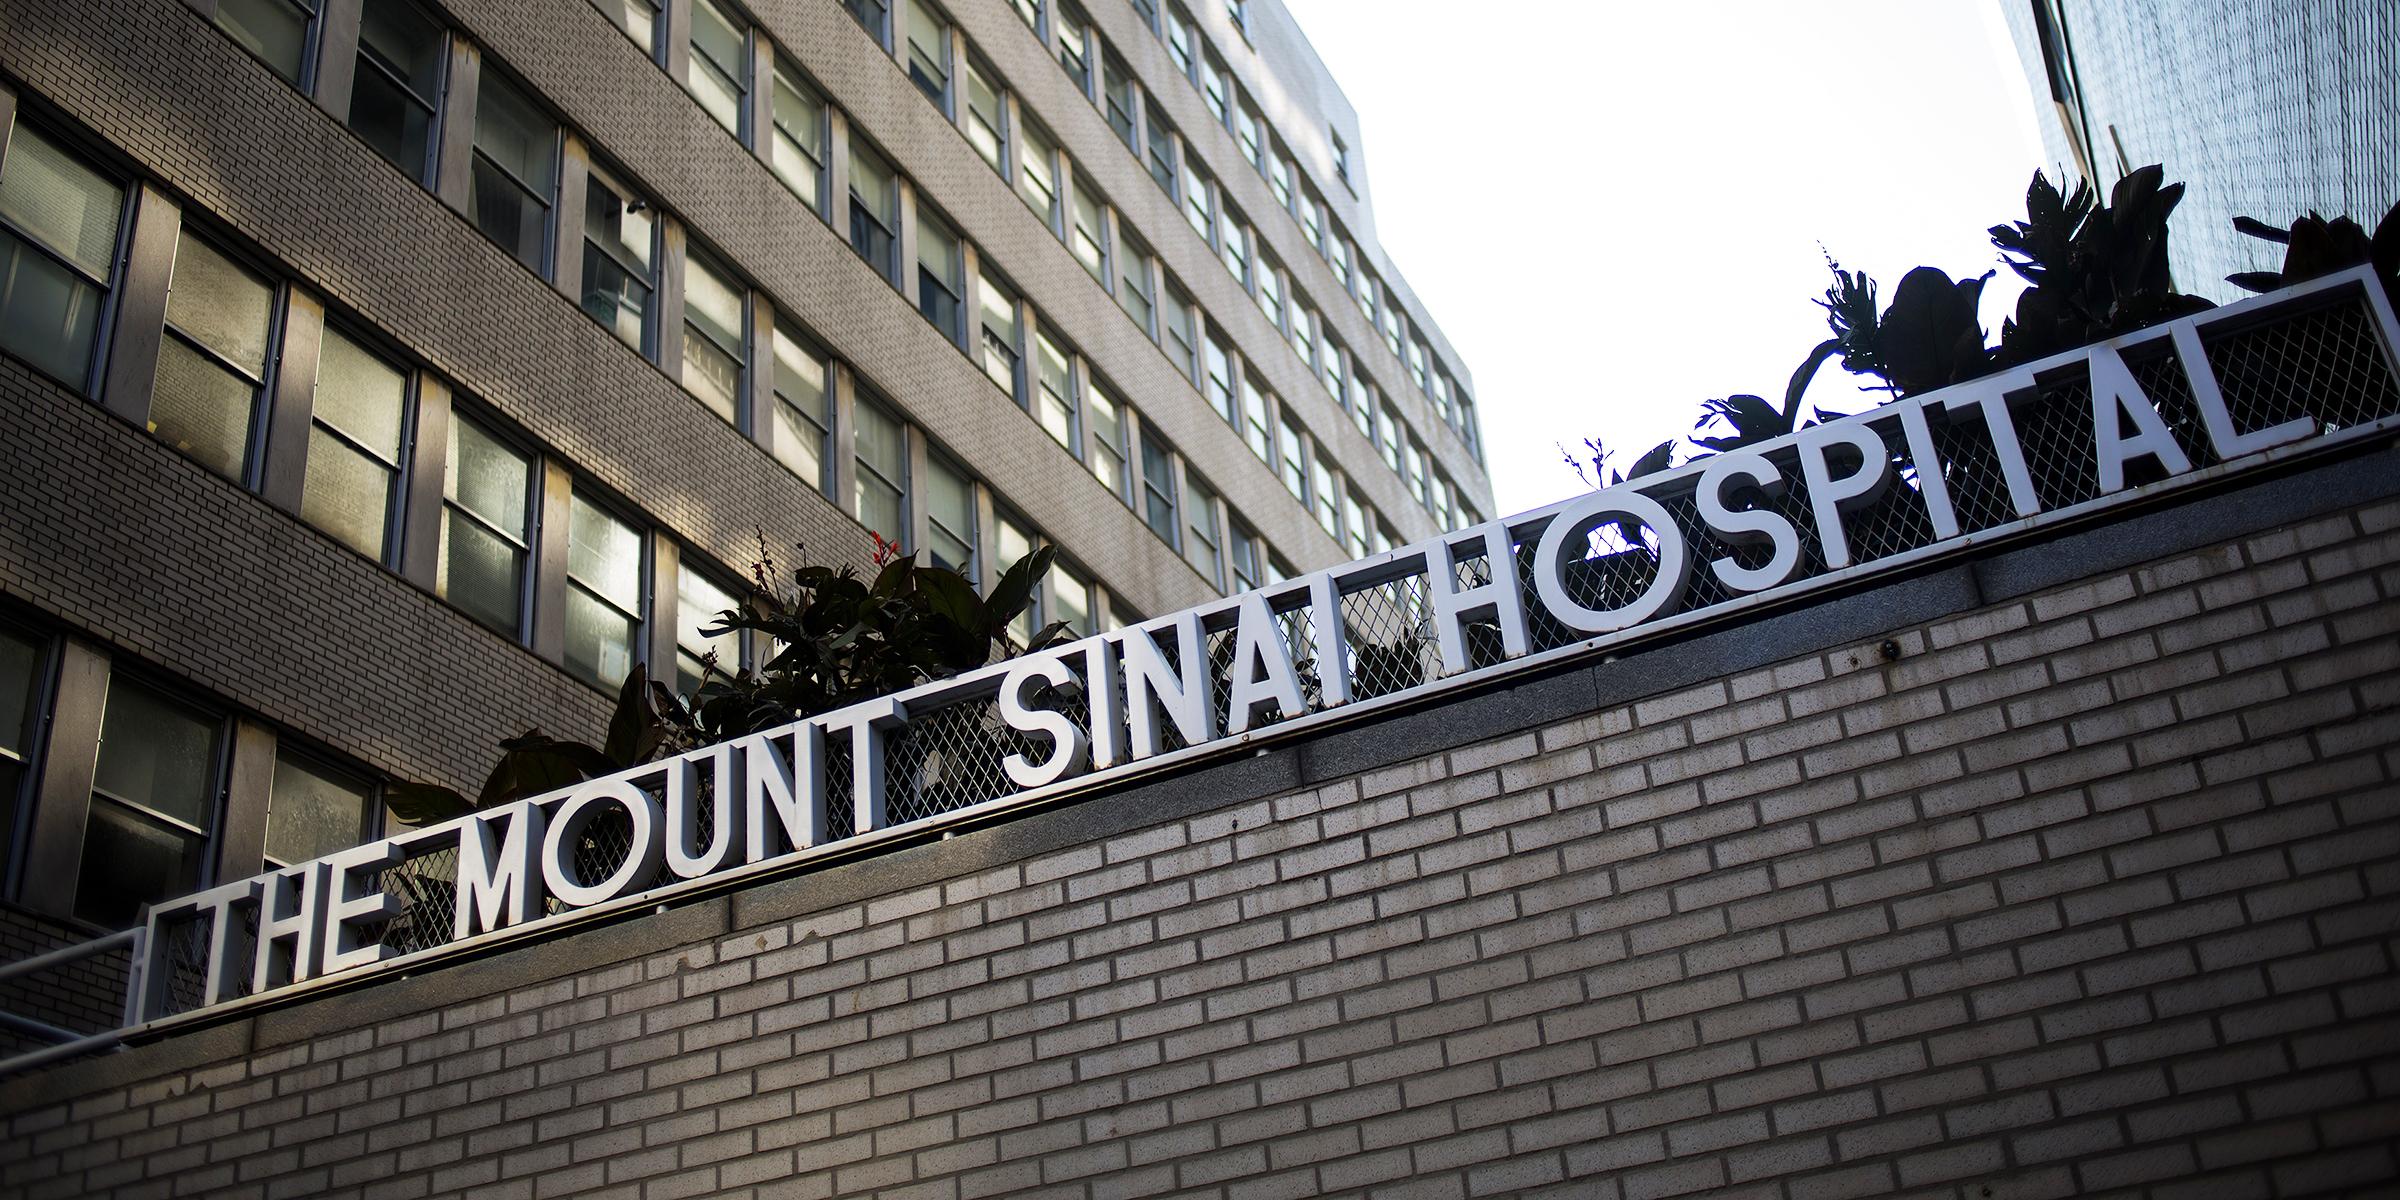 Nyc Hospital Responds To Photos Of Nurses Wearing Trash Bags